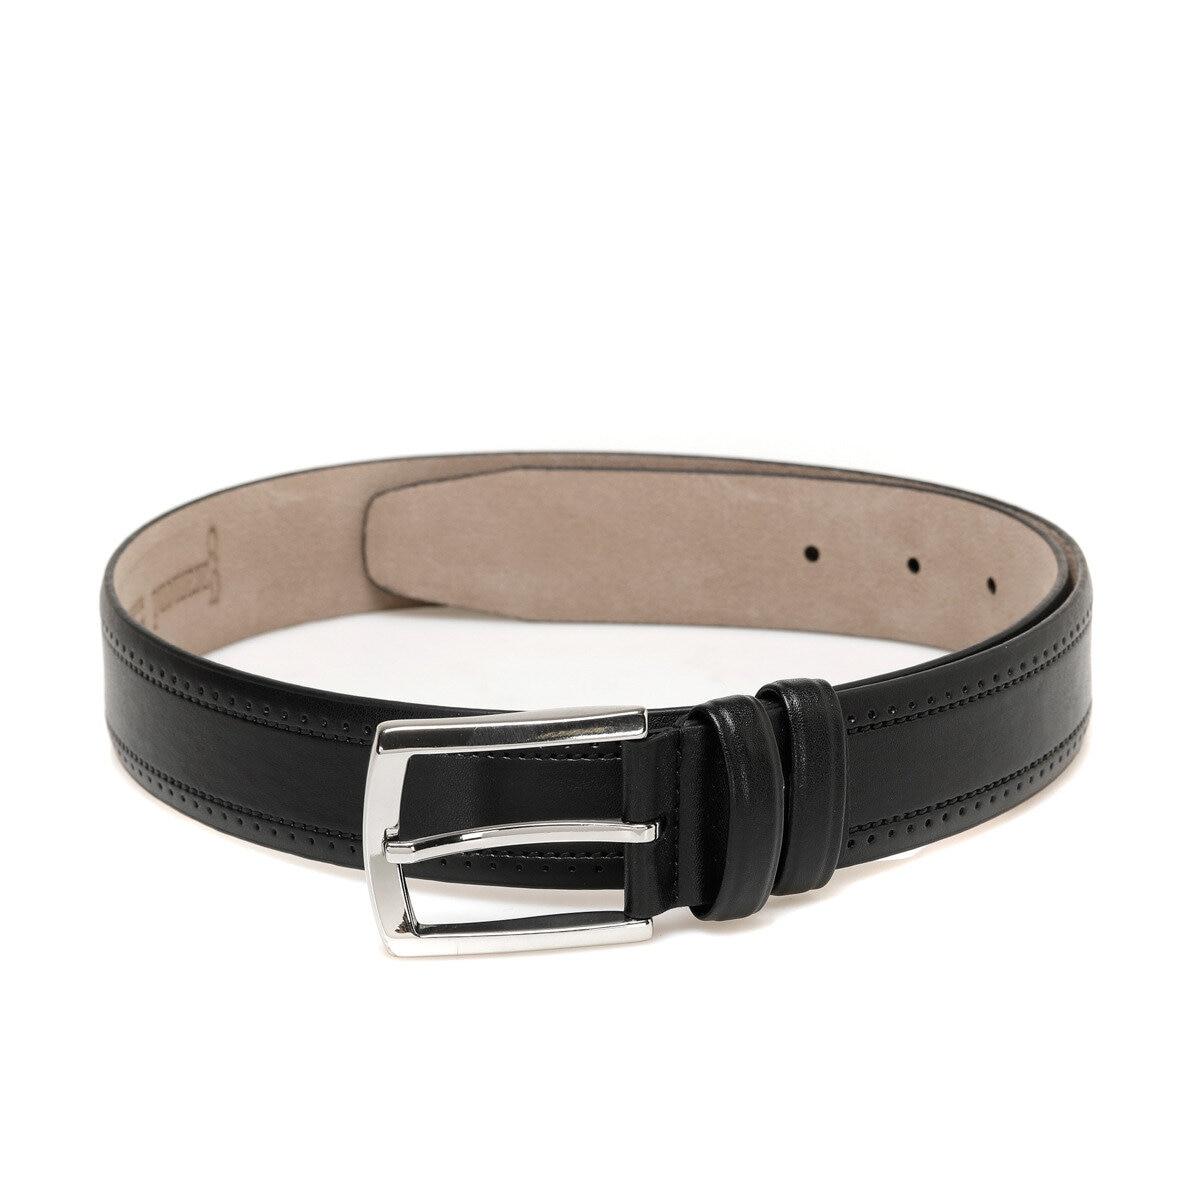 FLO 20M GK DLKLI Black Male Belt Garamond